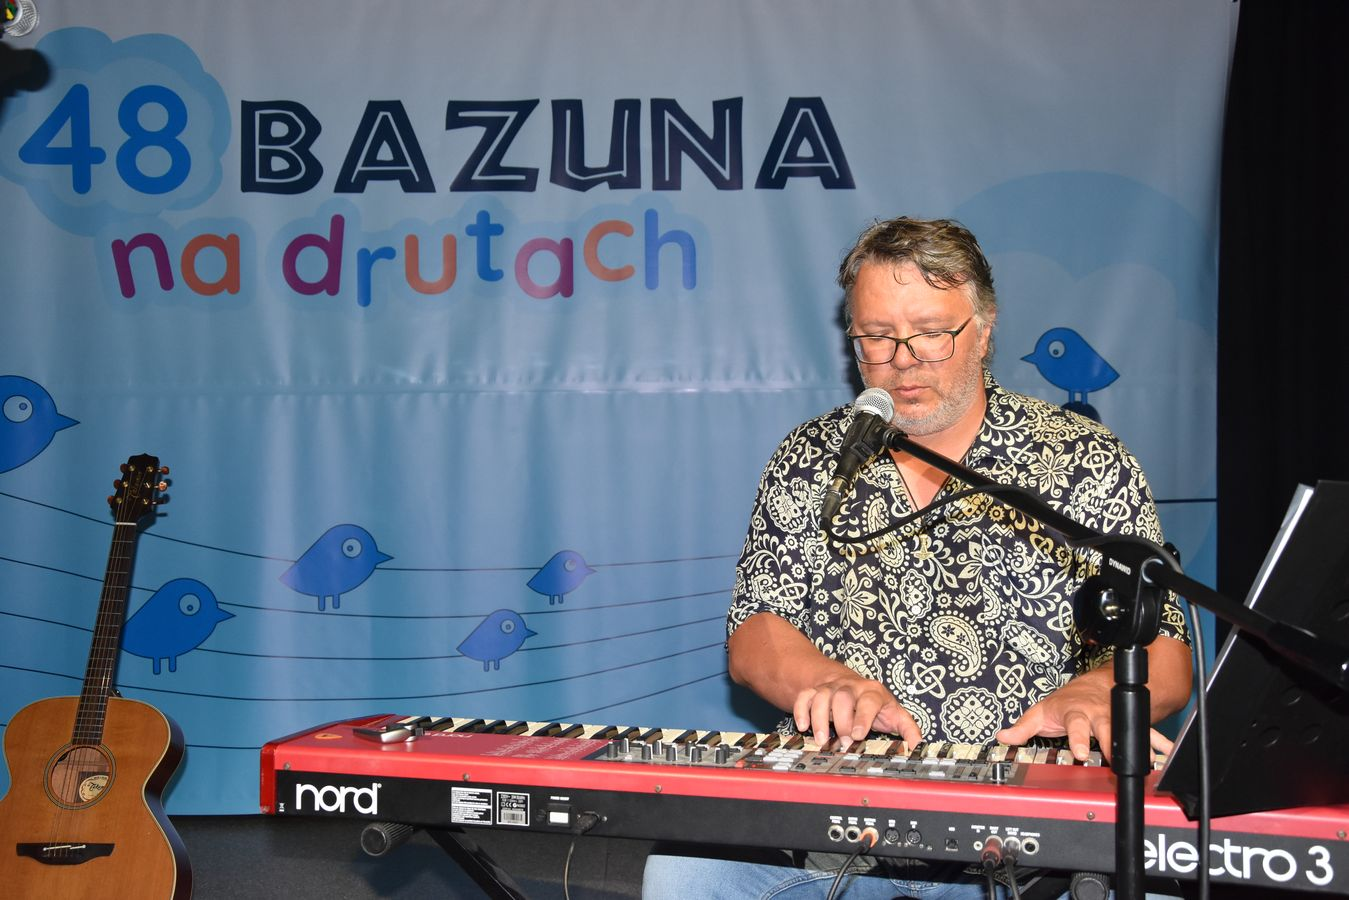 BAZUNA 2020 sobota Fot_J_Wikowski A31_0920